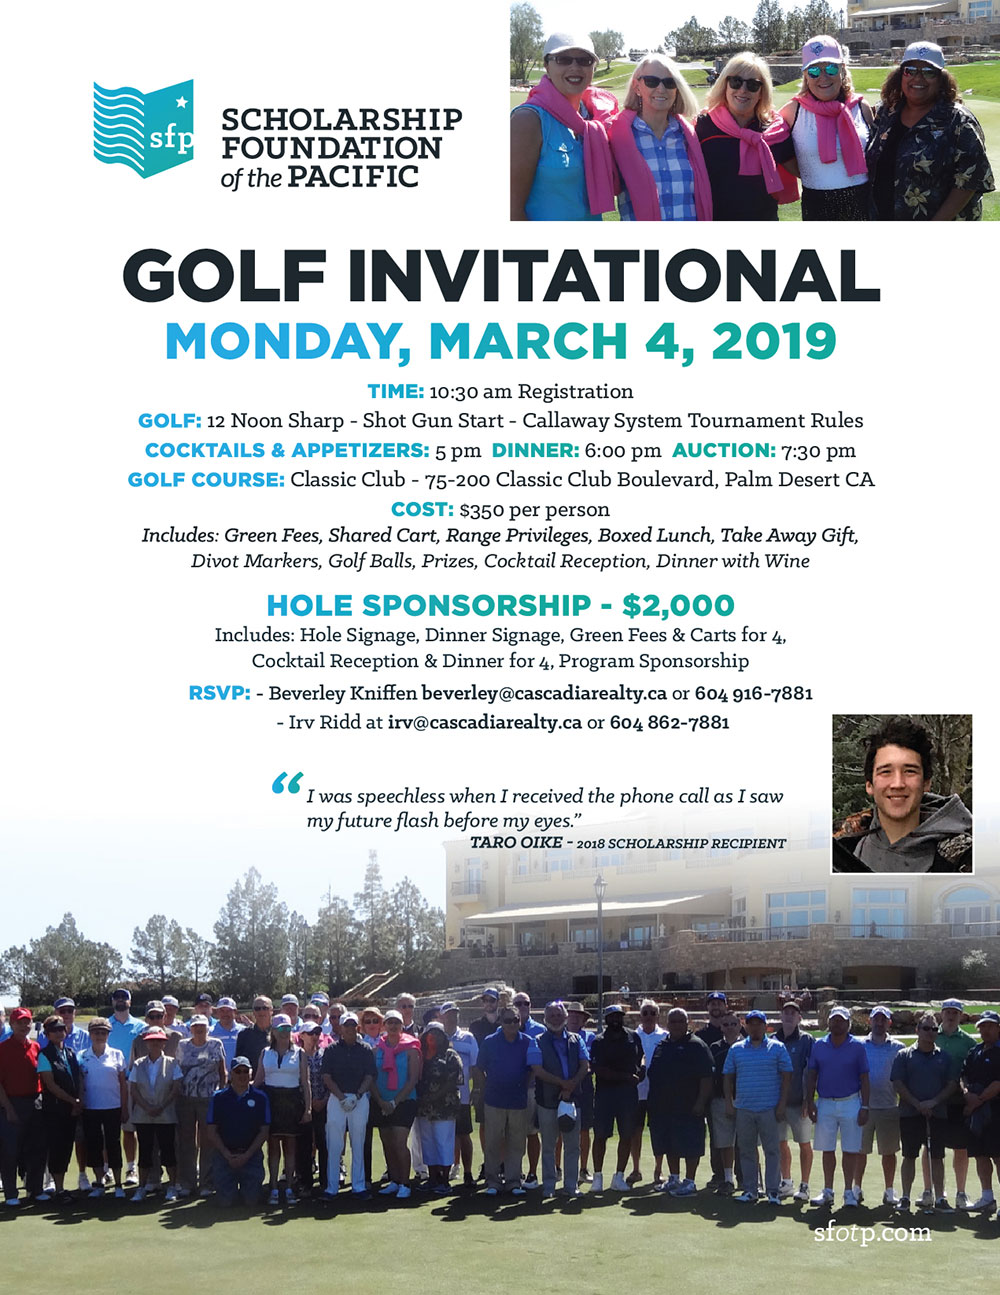 foundation_golf_invite_2019_OUT.jpg